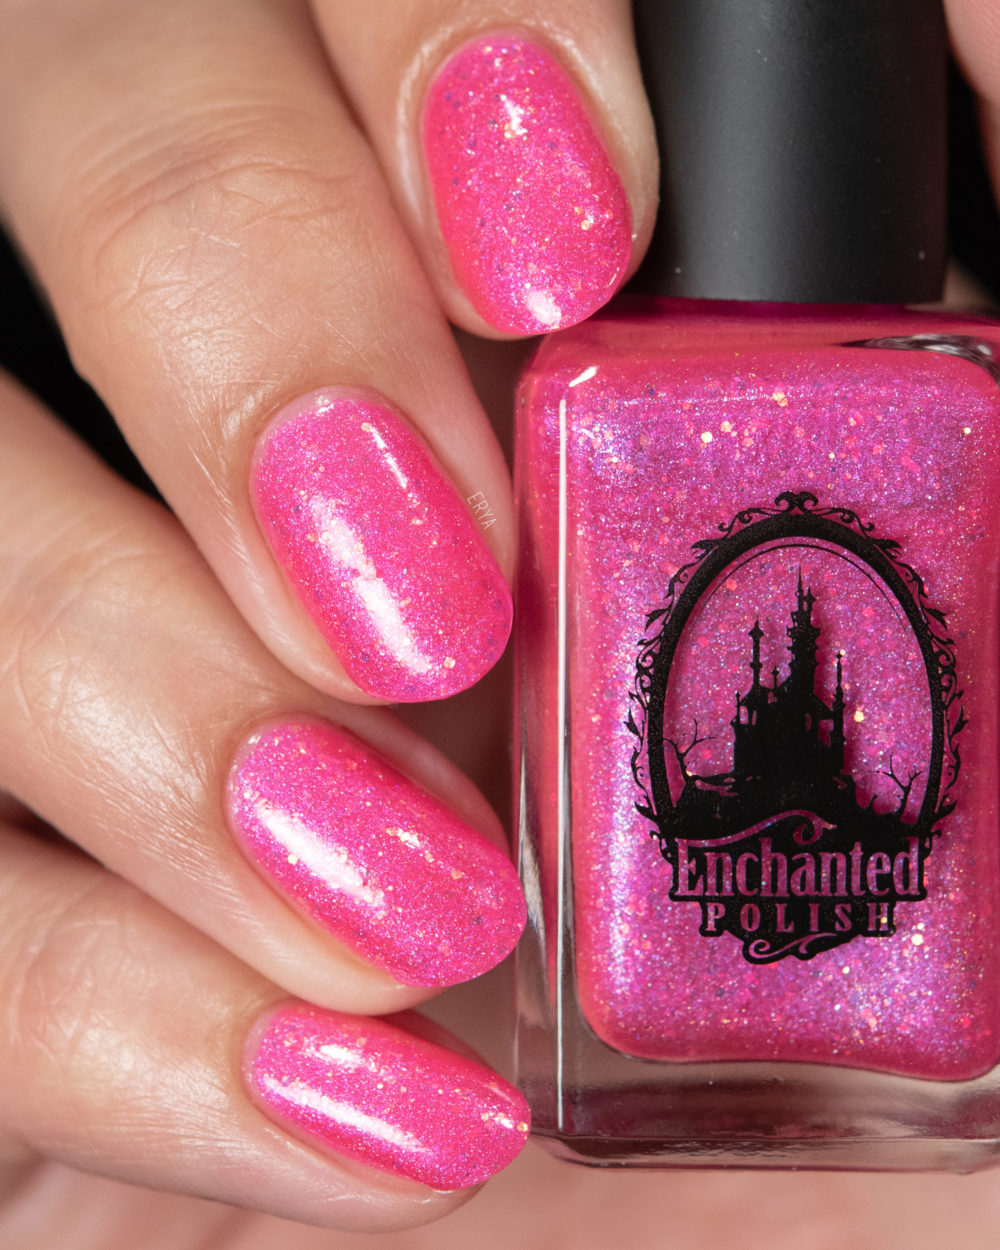 Enchanted_Polish-Opalicious-5